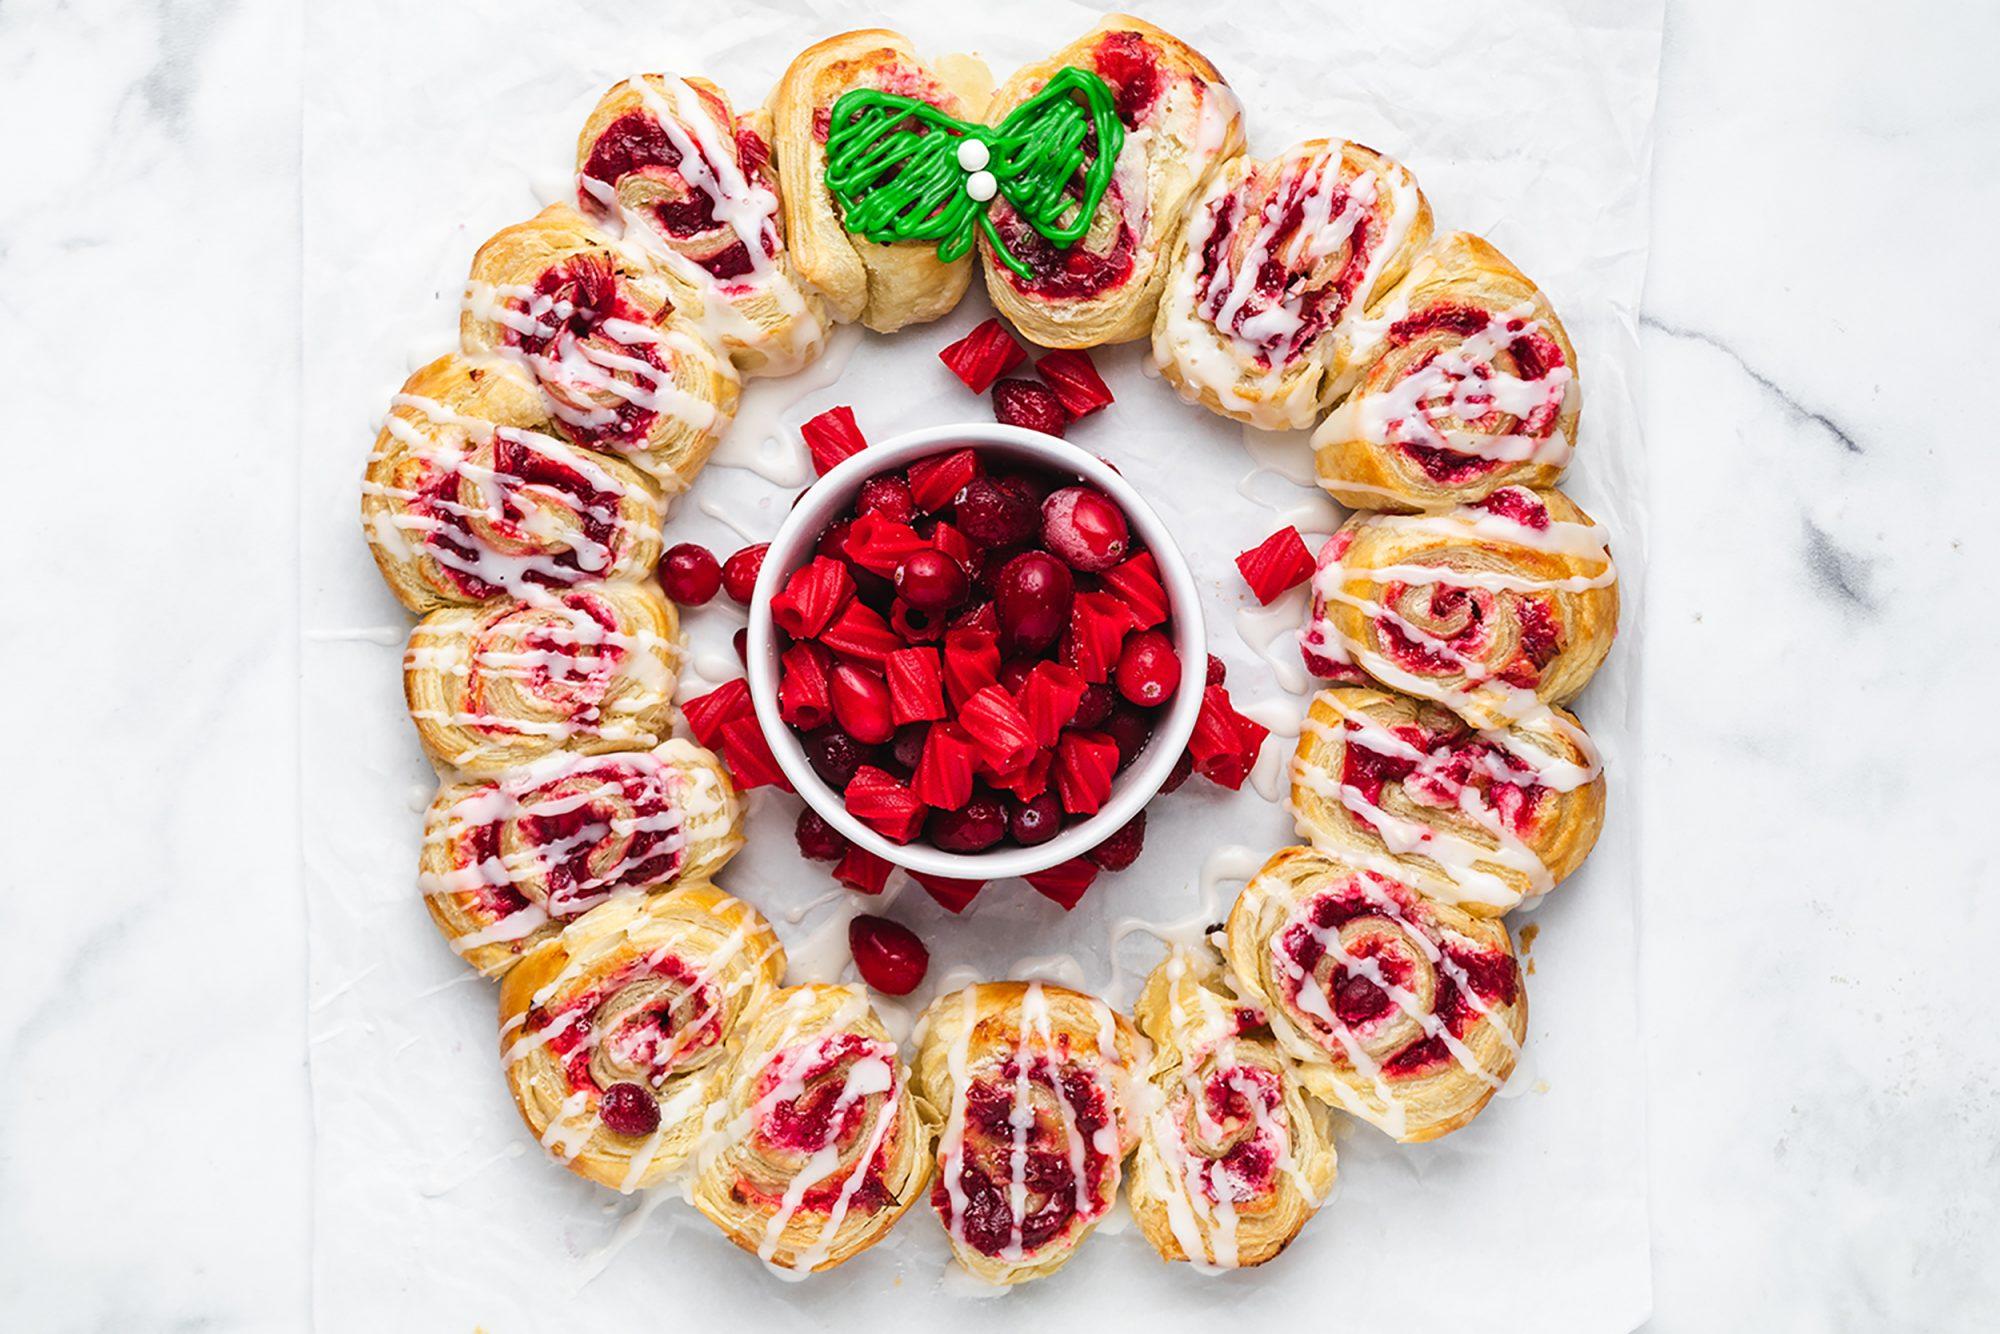 Red Vines Danish Wreath